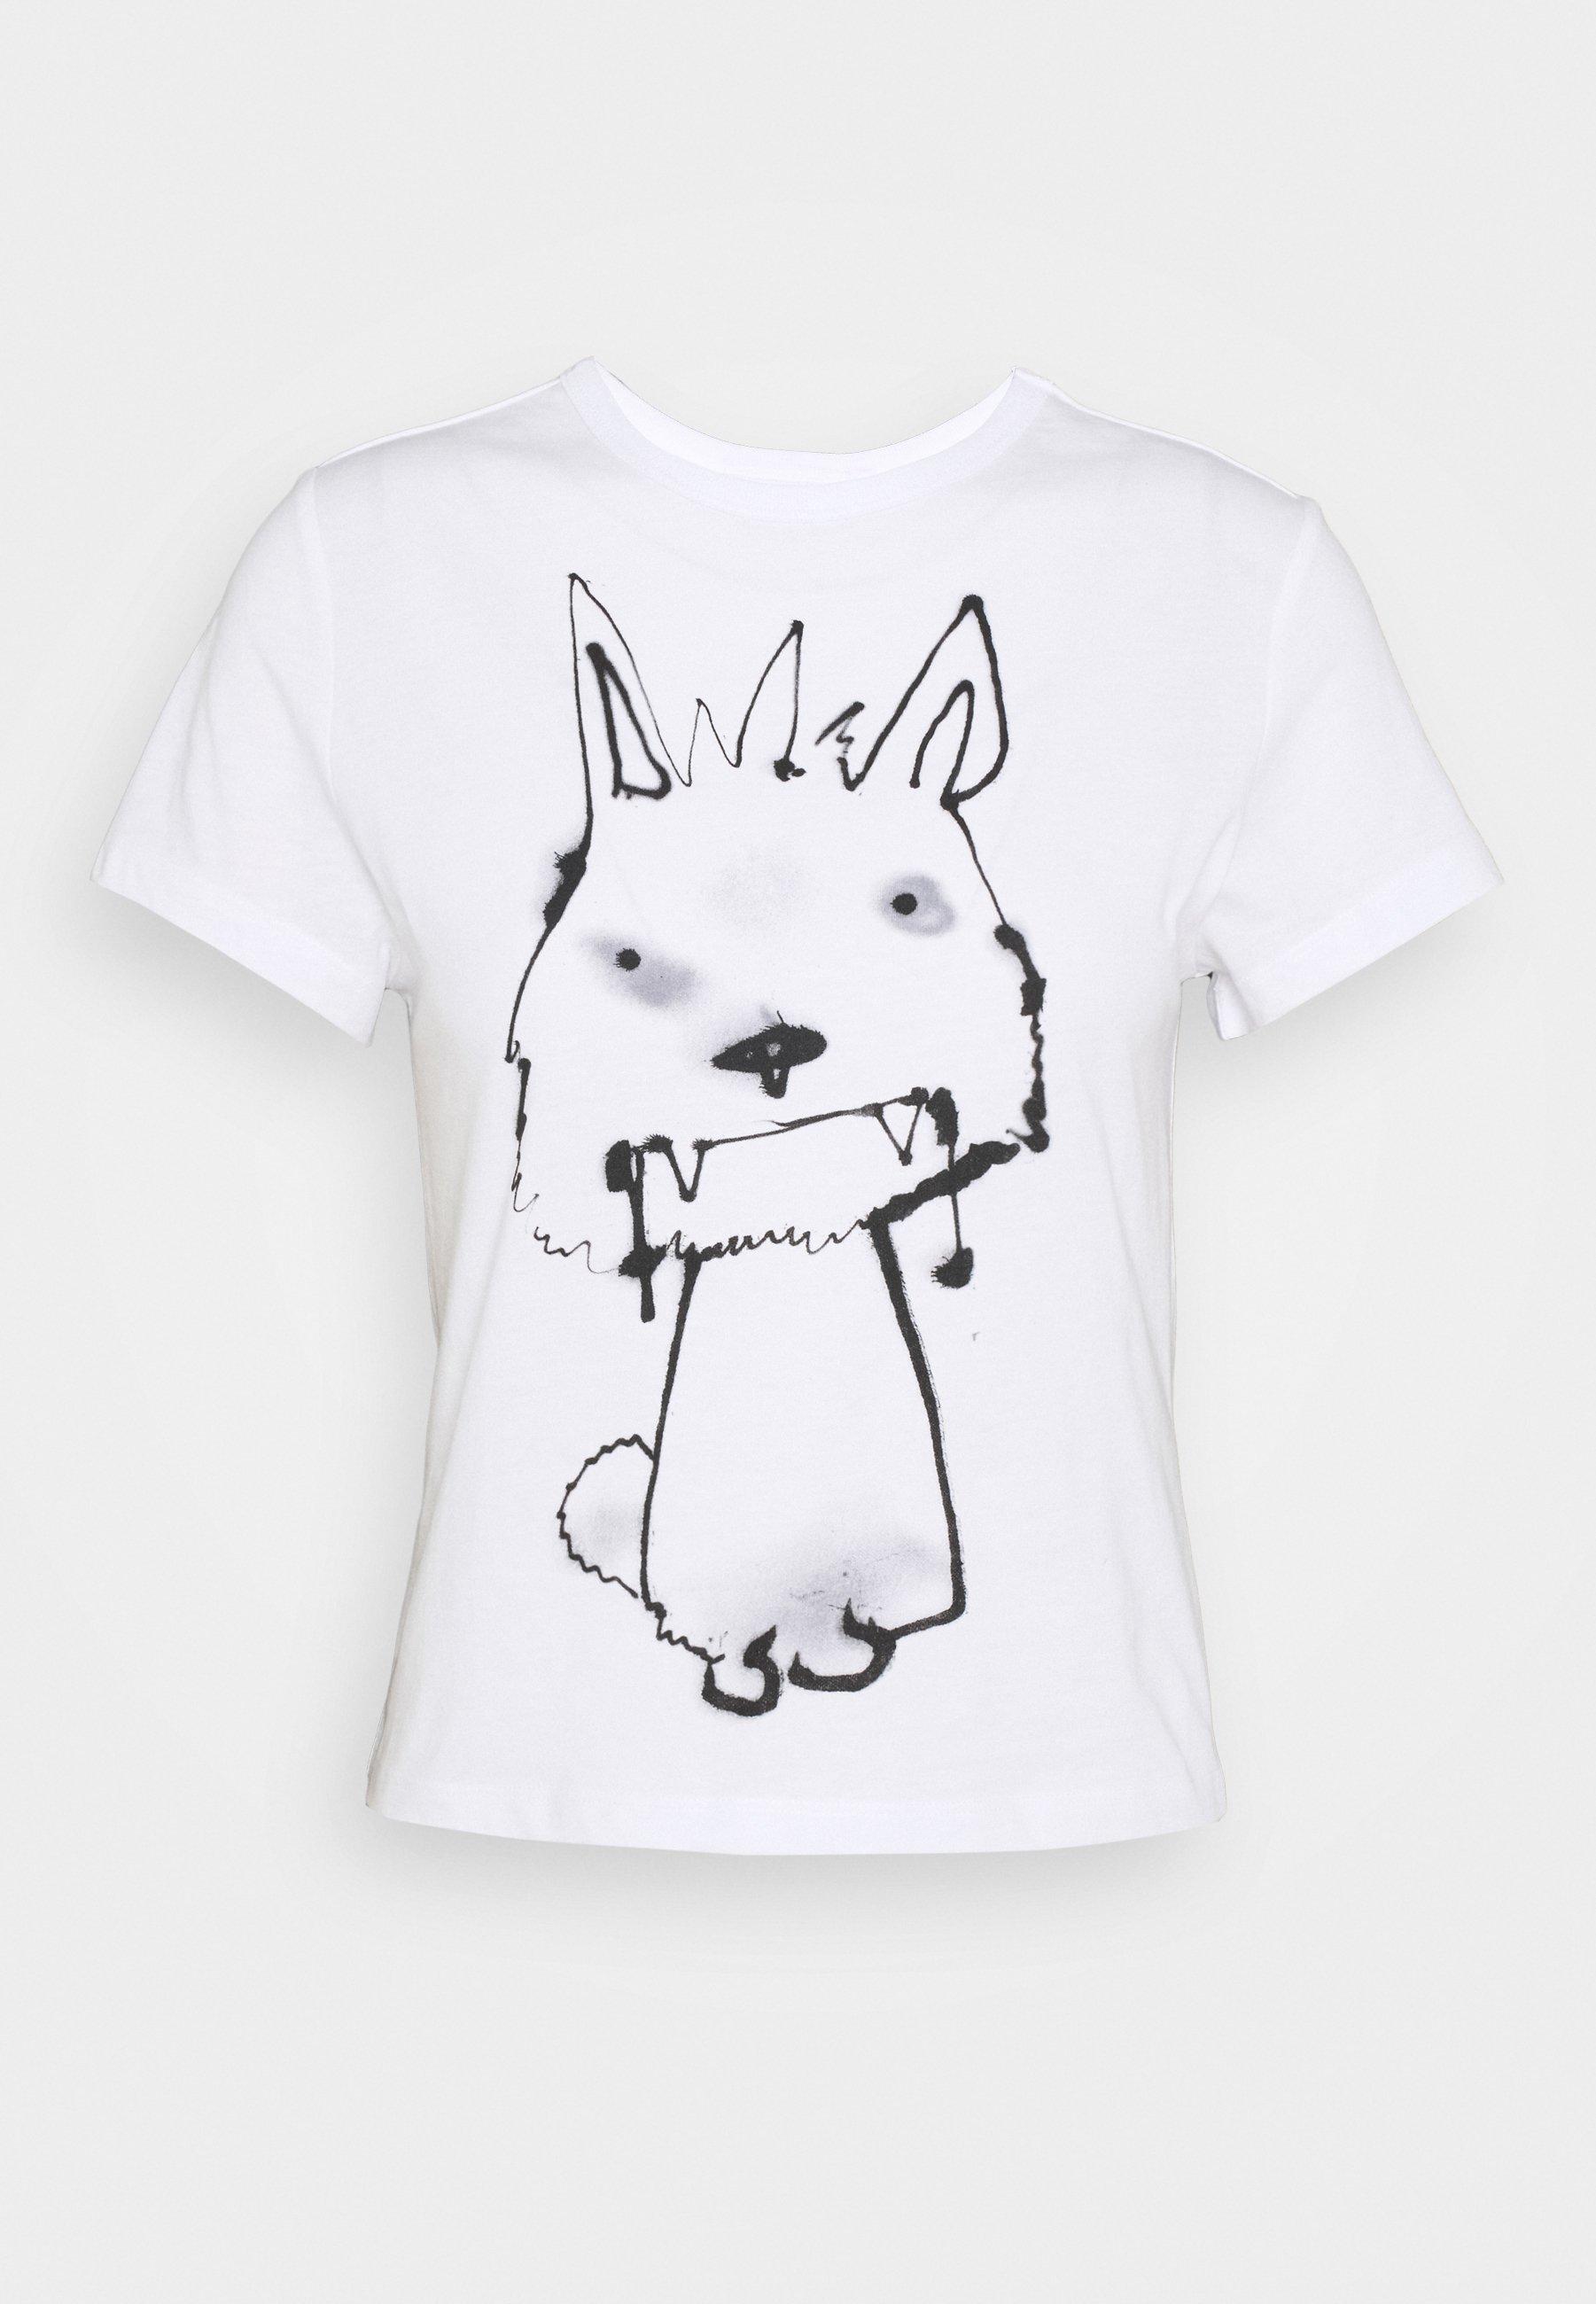 Weekday Forever - T-shirts Med Print Thirsty Dog/hvit